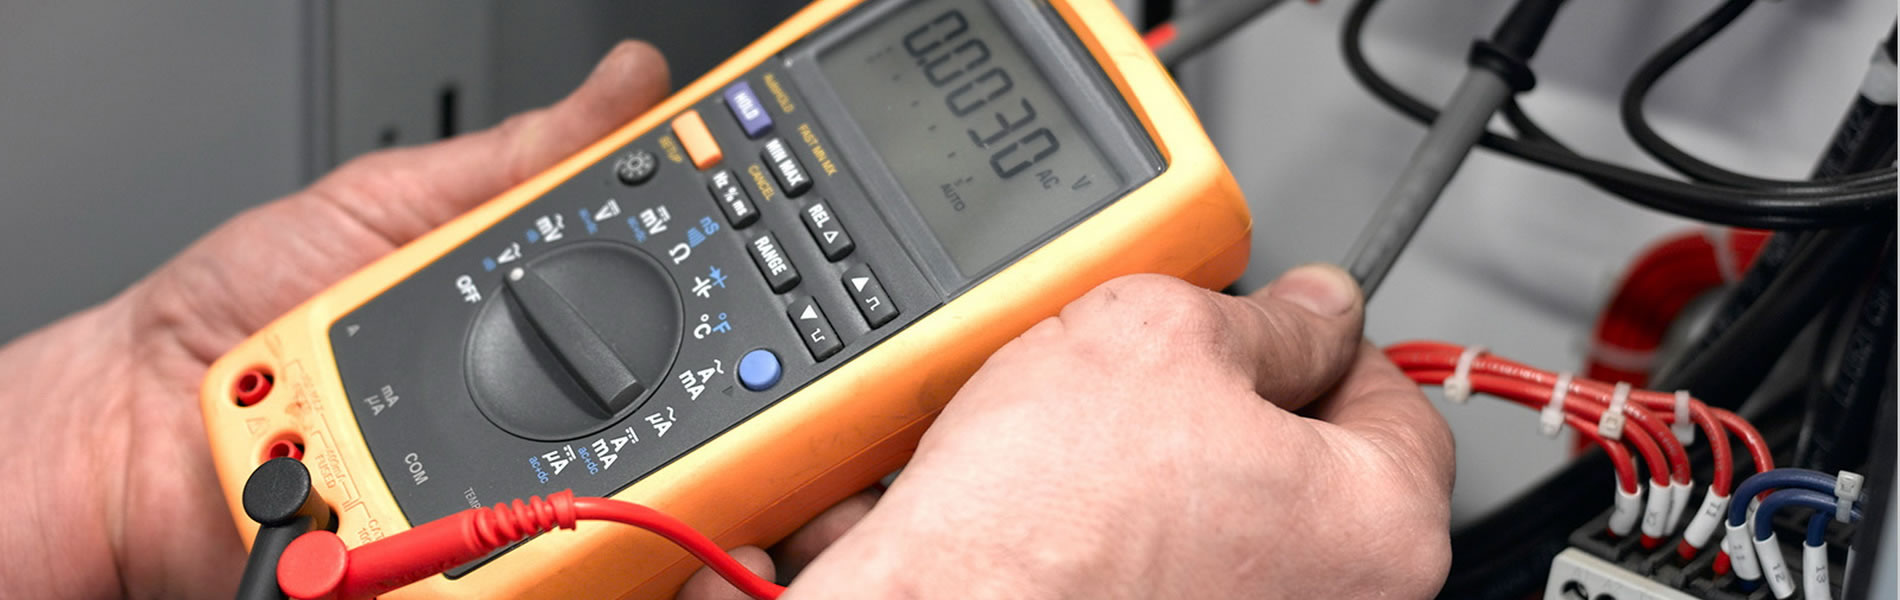 ThermoAir Electrical Services Esperance